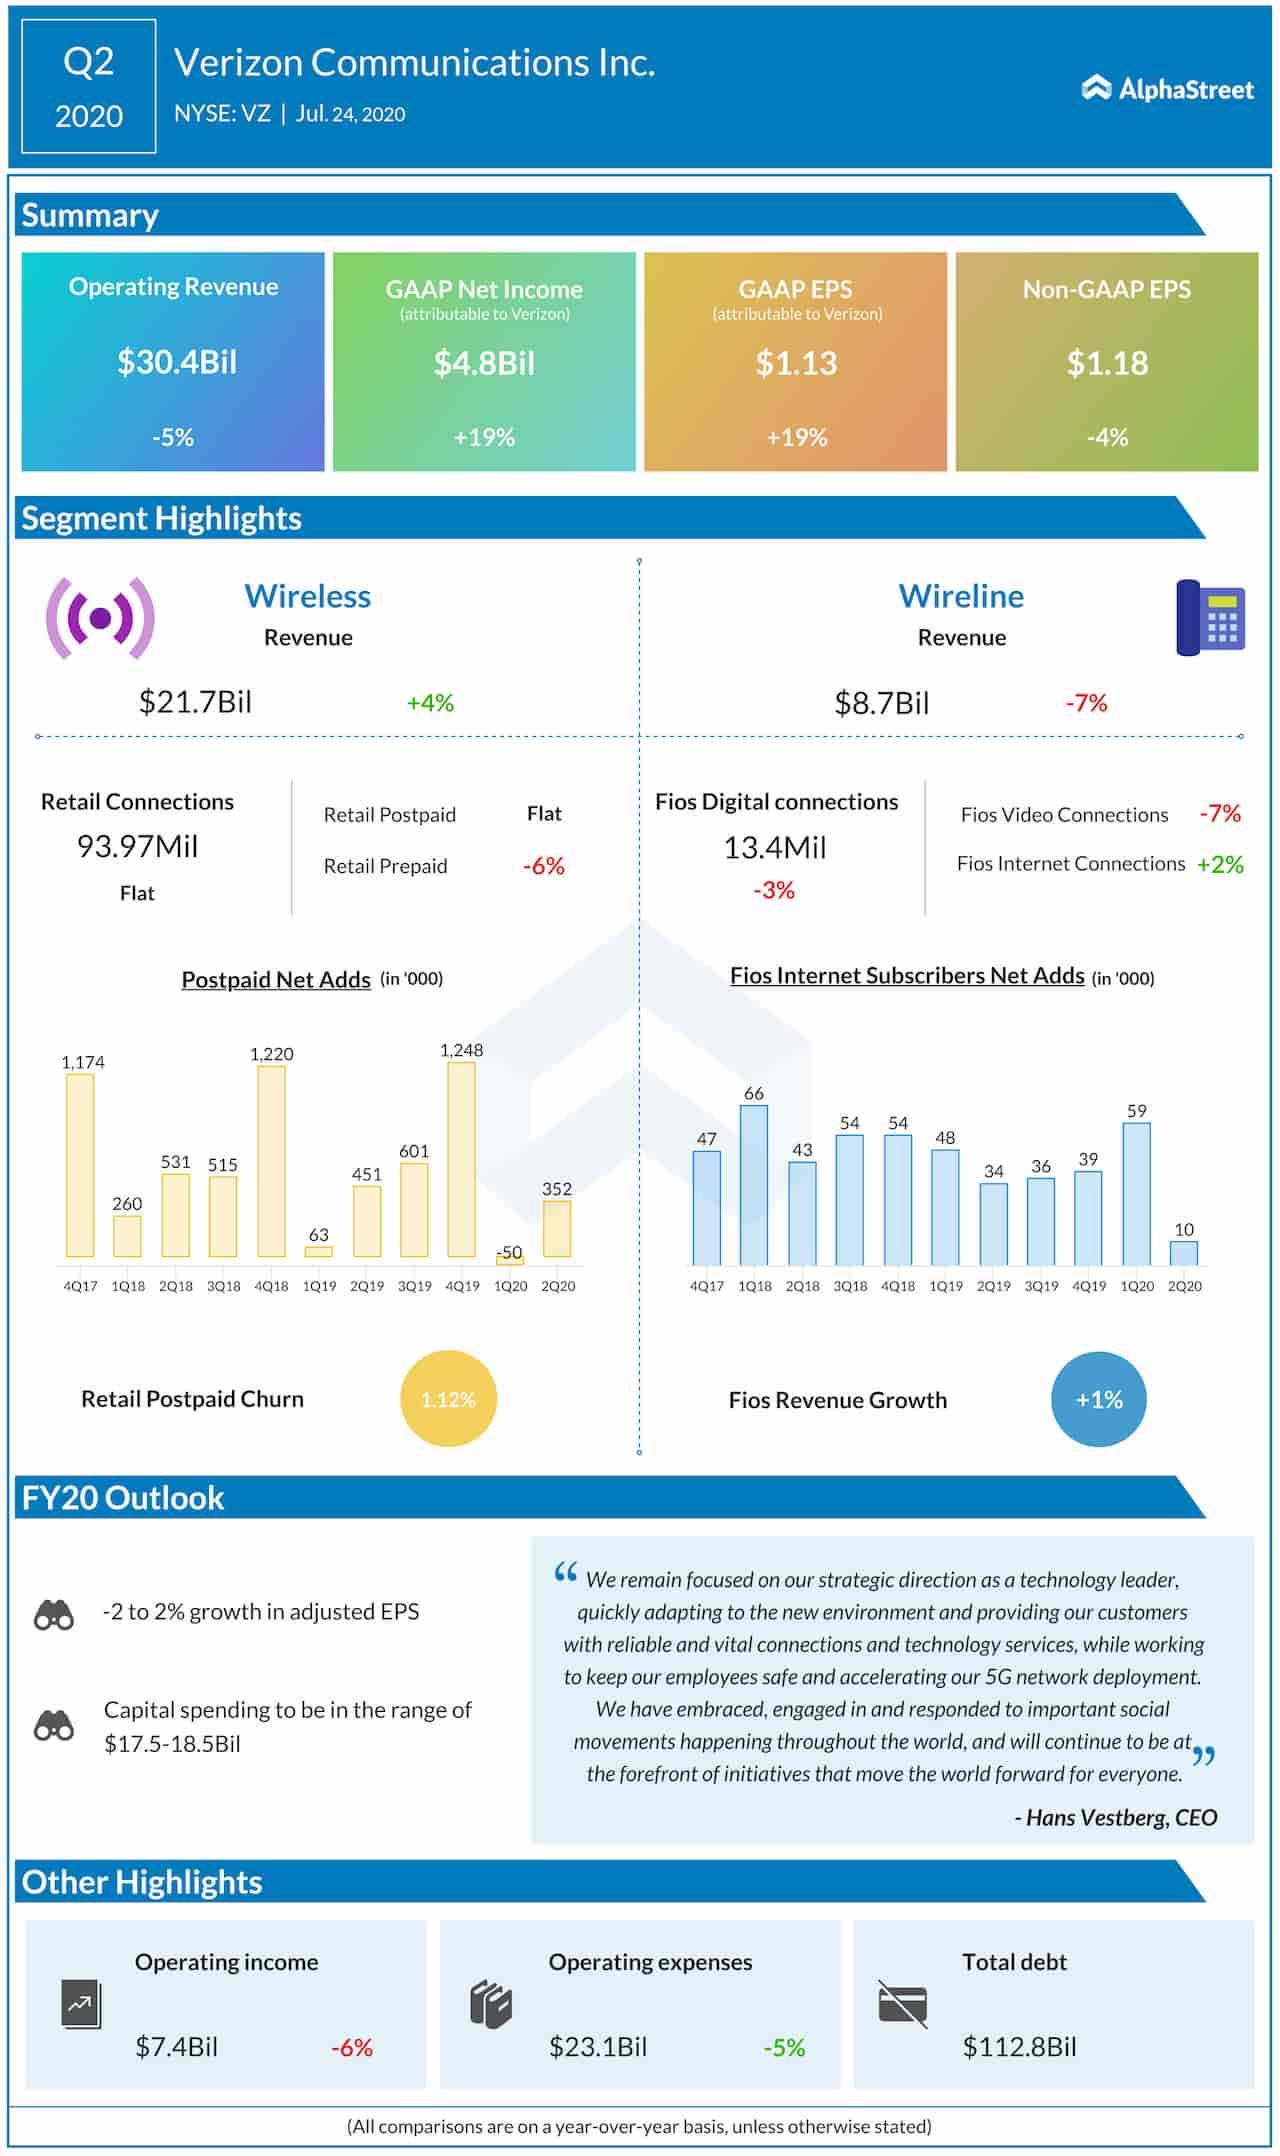 Verizon Q2 2020 Earnings Infographic